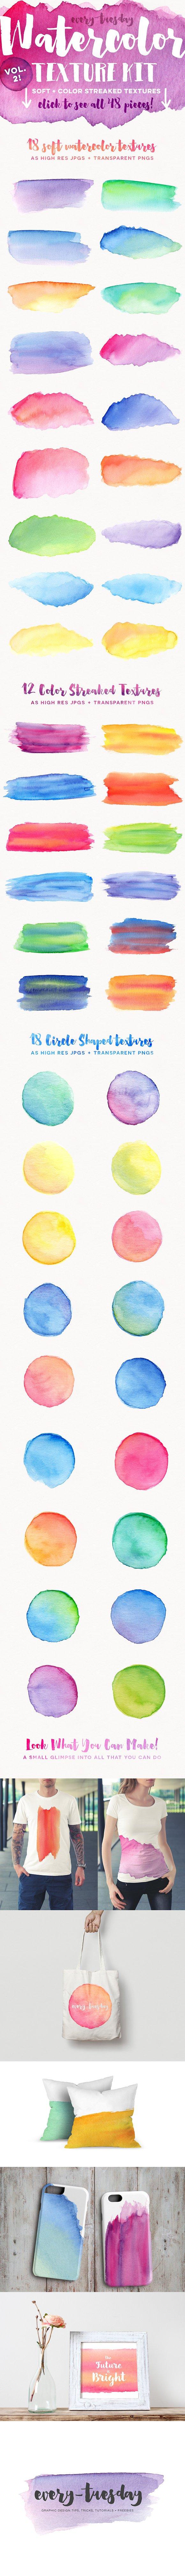 Watercolor Texture Kit Vol. 2 - Textures